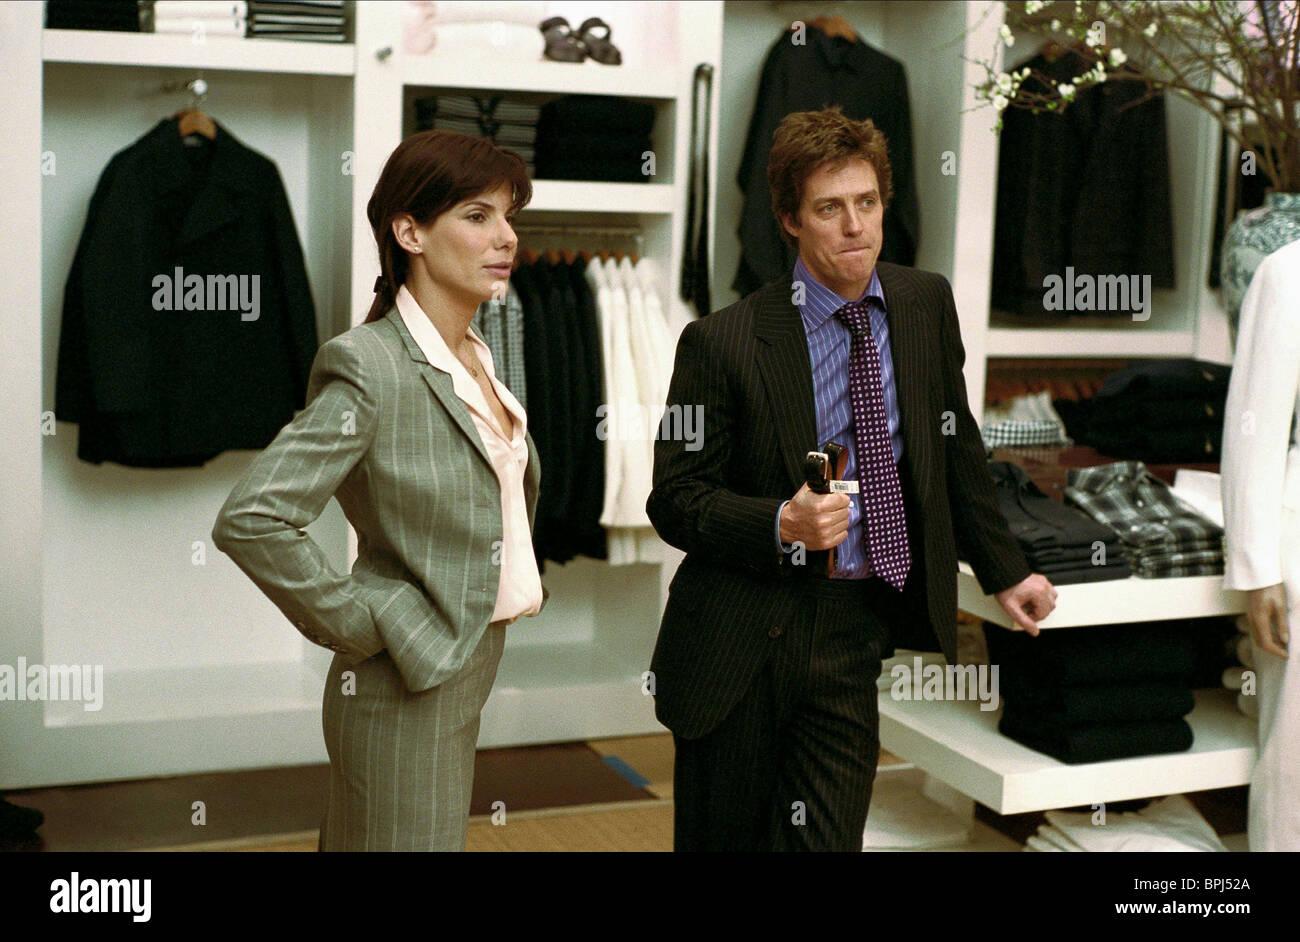 Sandra Bullock Hugh Grant Two Weeks Notice 2002 Stock Photo Alamy